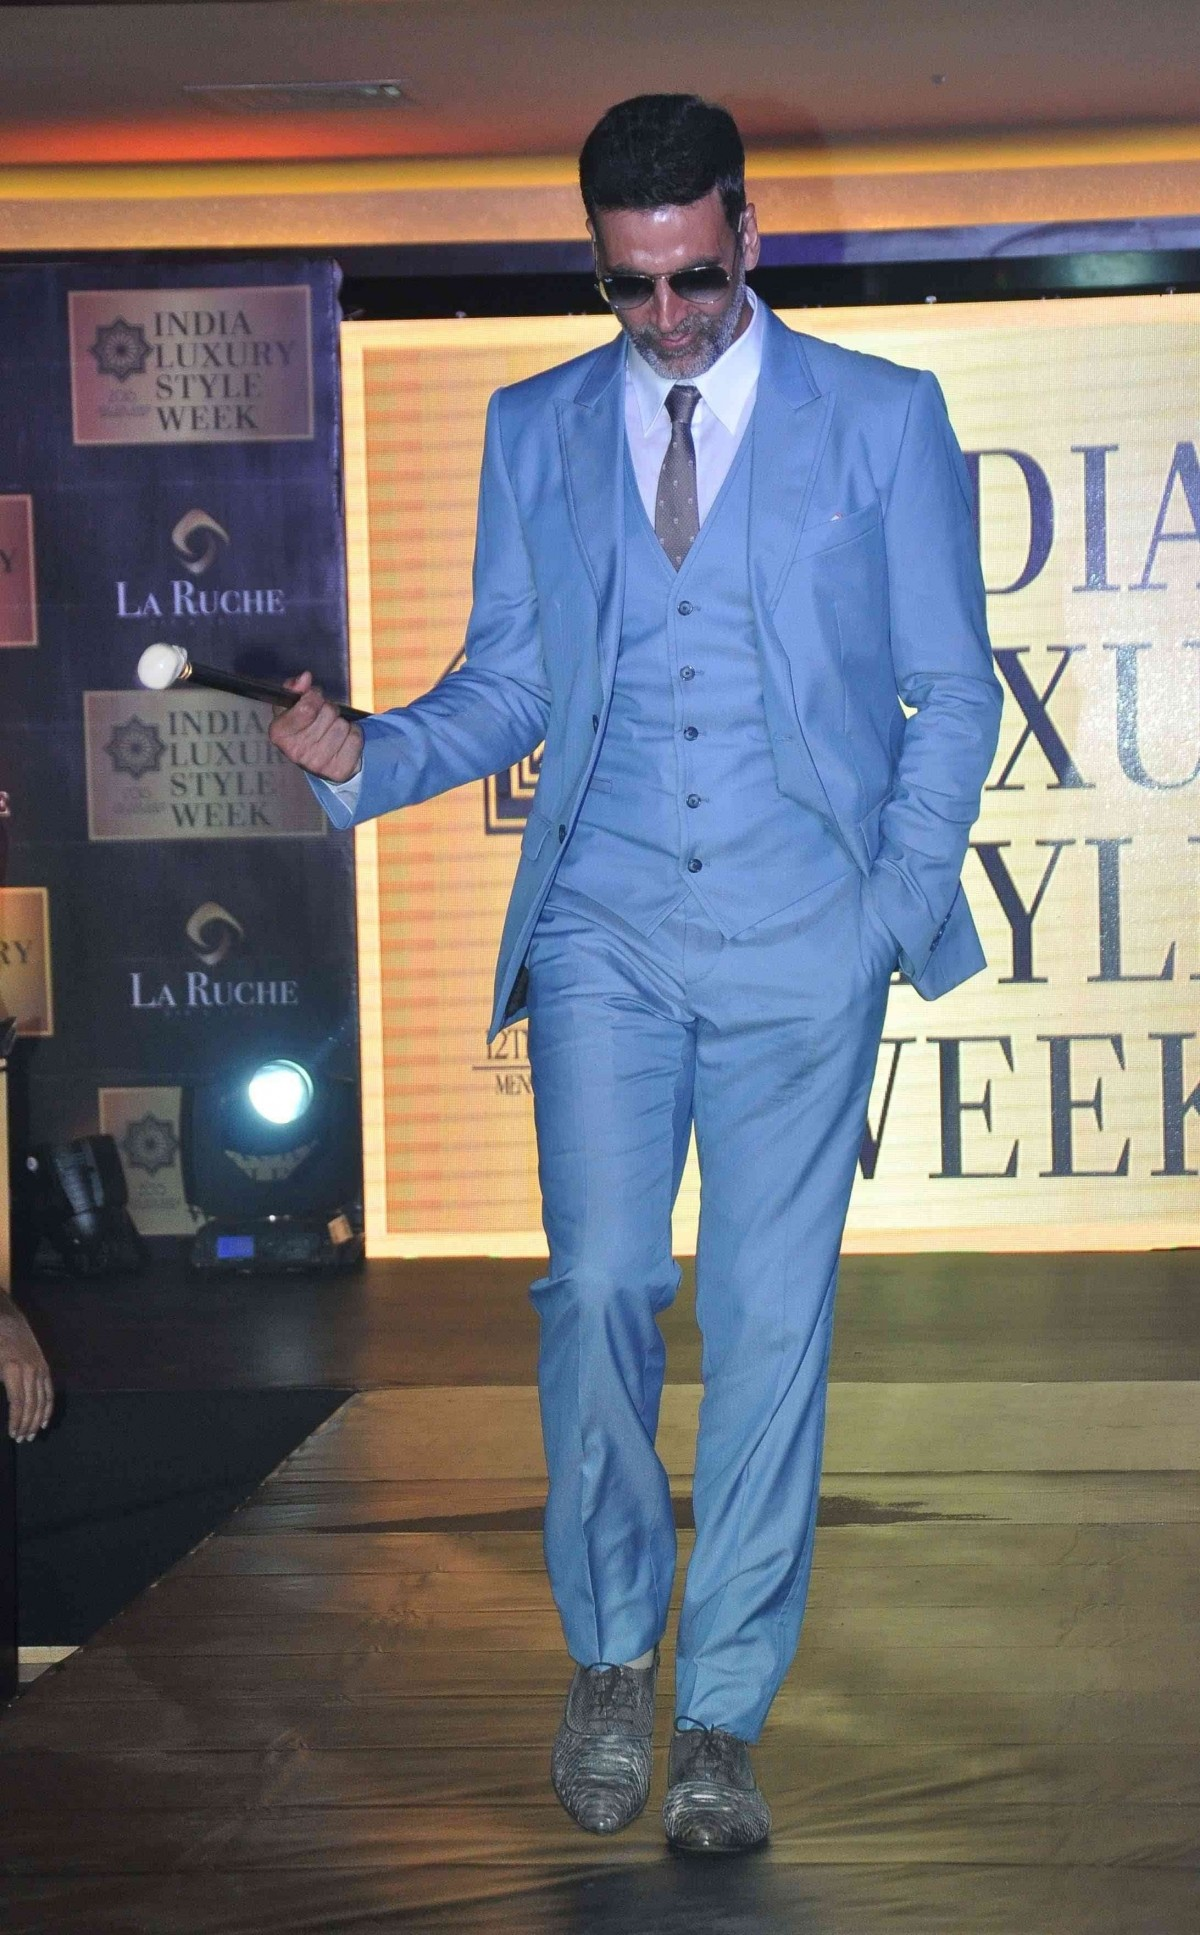 Akshay Kumar Walks The Ramp at The India Luxury Style Week 2015